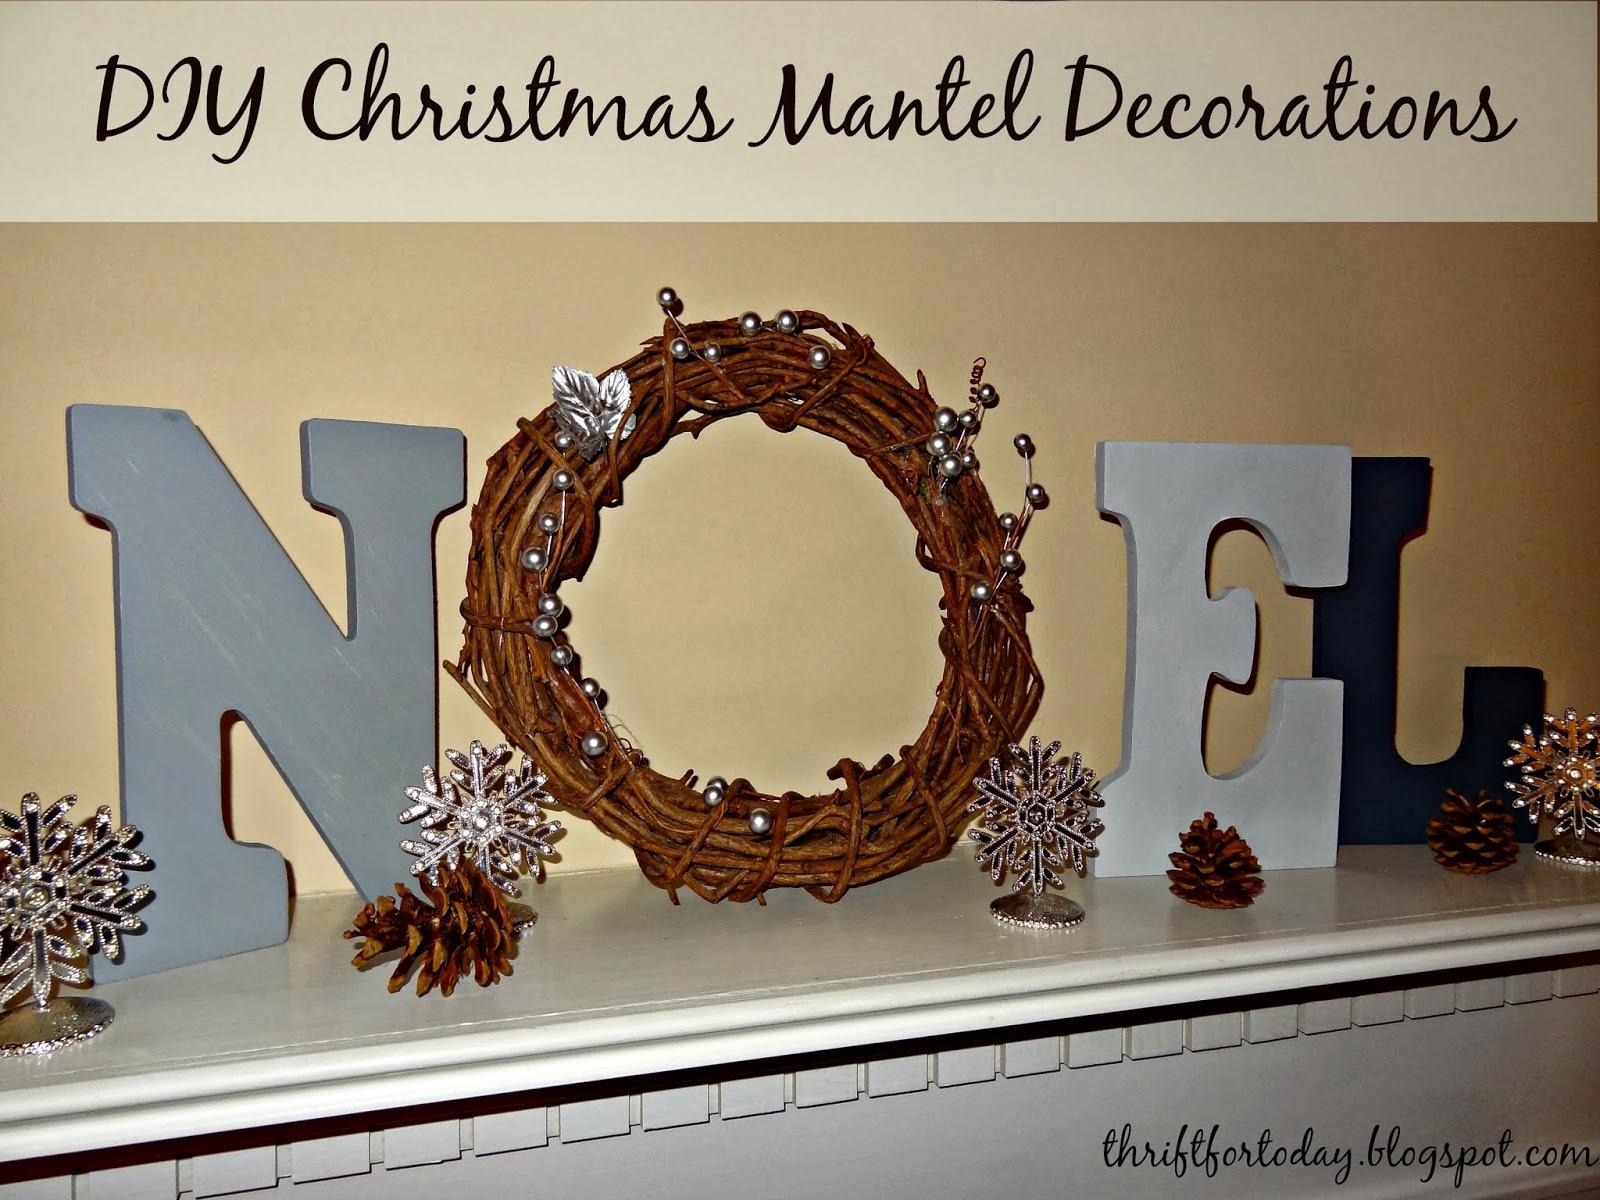 #654125 Thrift For Today: DIY Christmas Mantel Decor: Noel Sign 5509 decorations de noel shabby 1600x1200 px @ aertt.com